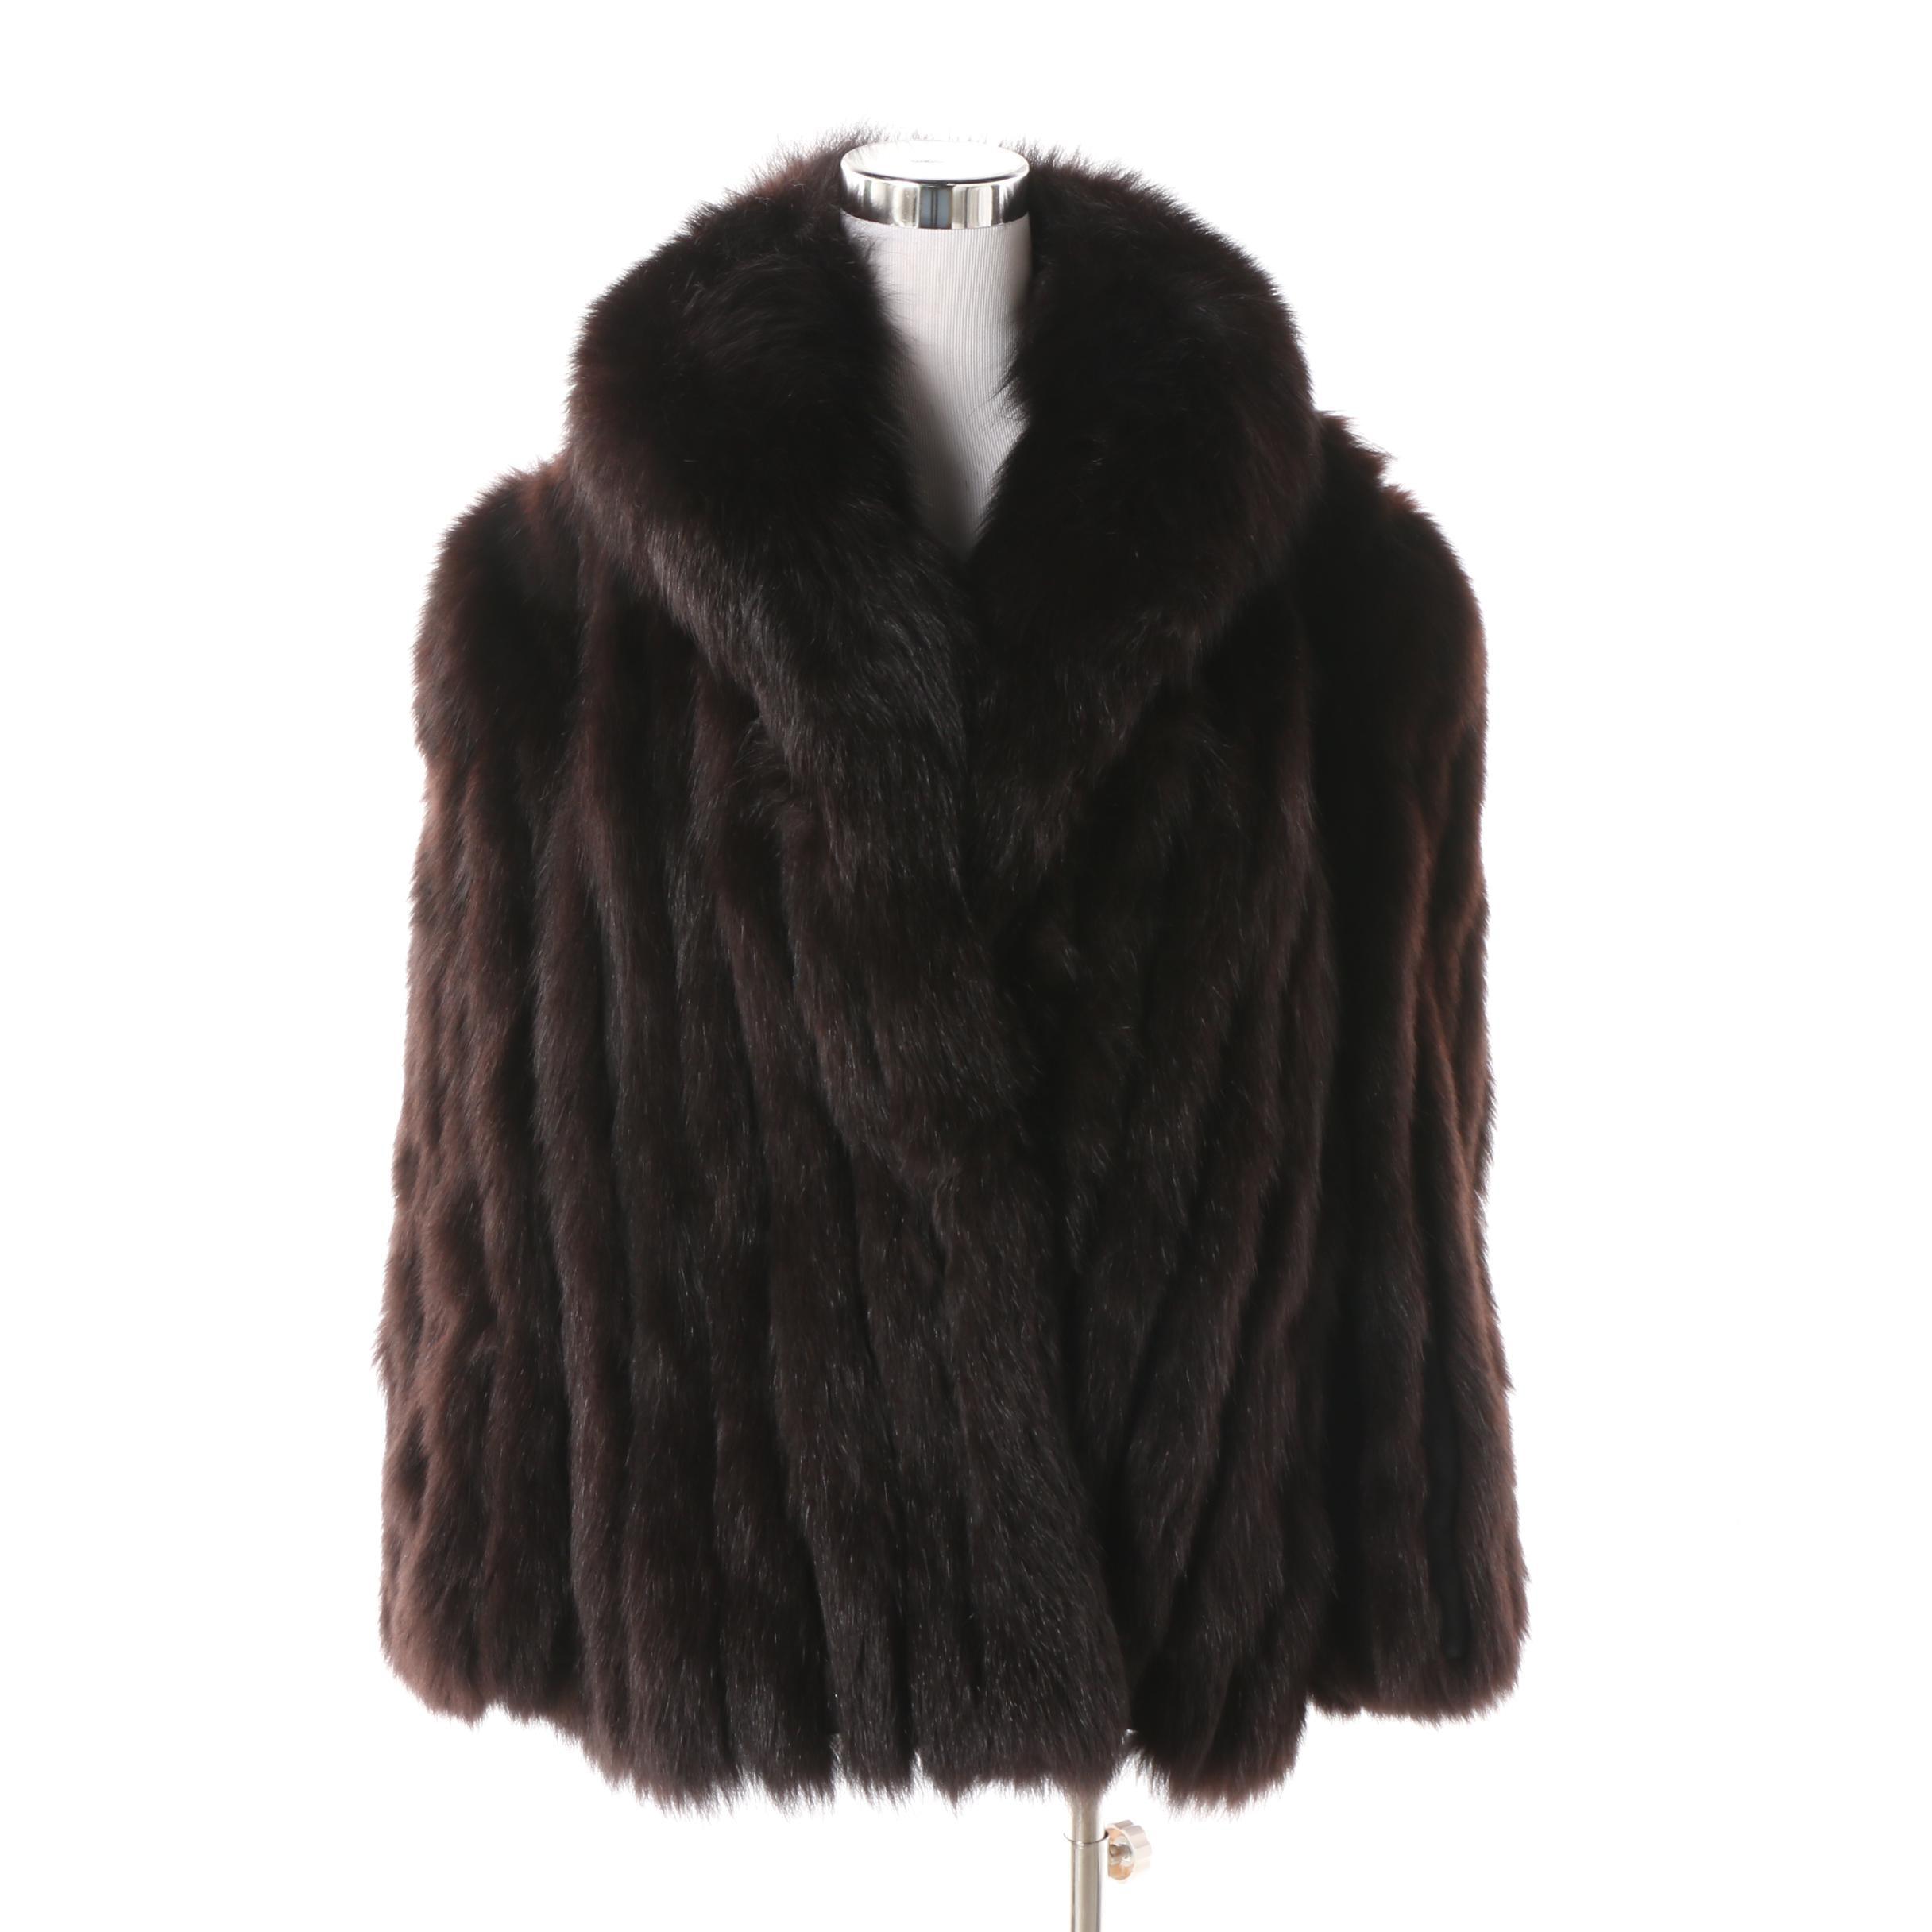 Women's Scandinavian Fur Company Dyed Dark Brown Fox Fur Jacket